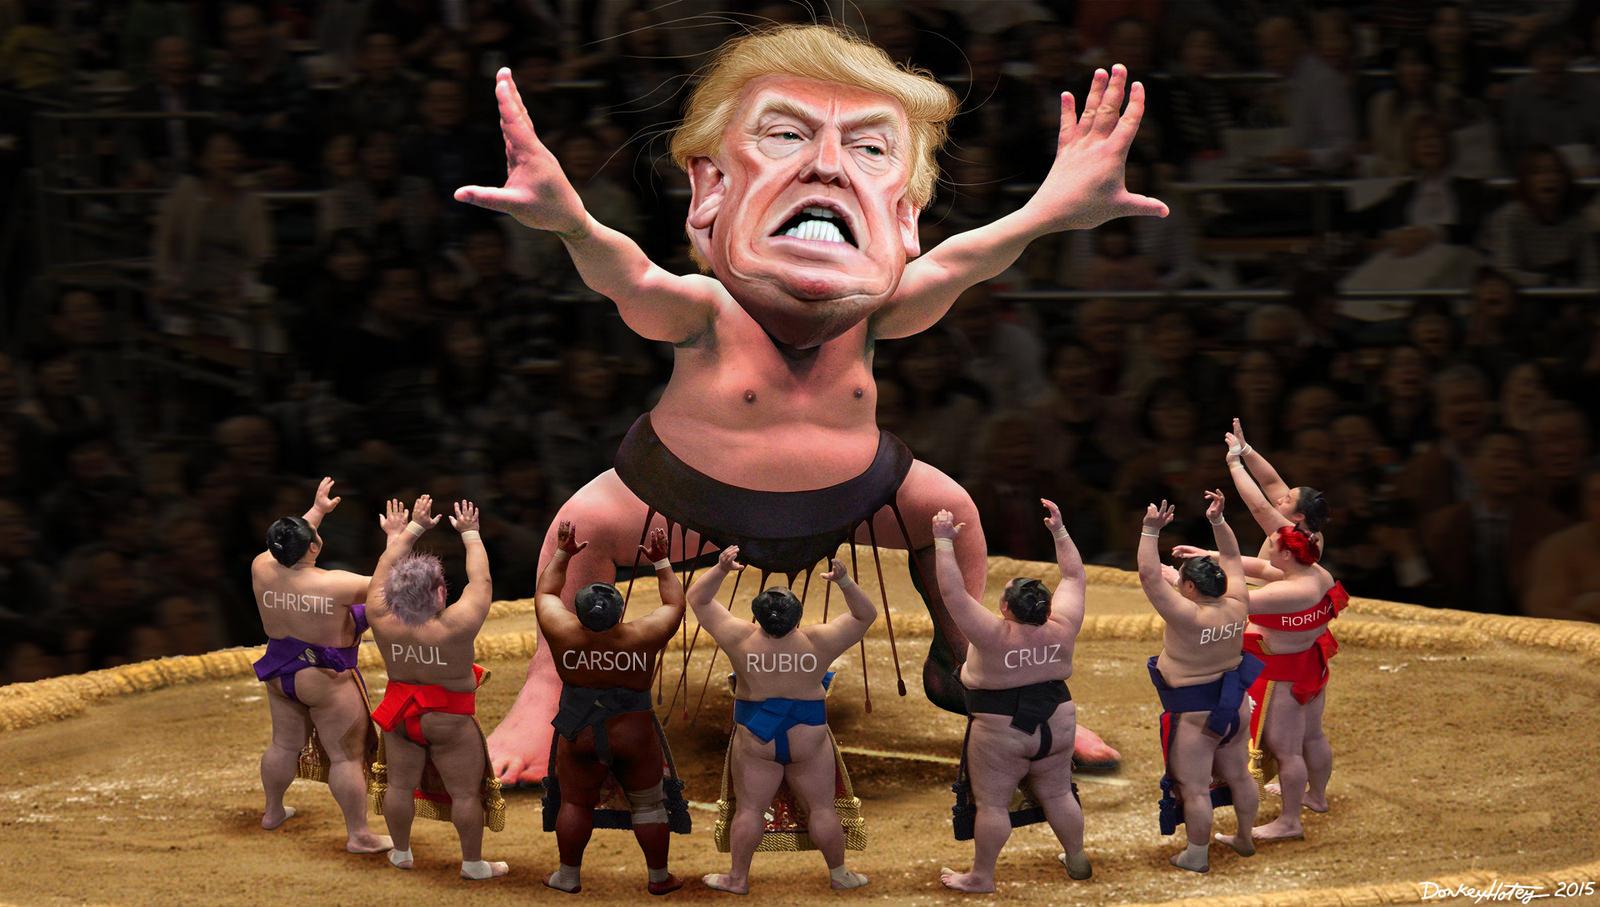 Donald-Trump-Caricature.jpg